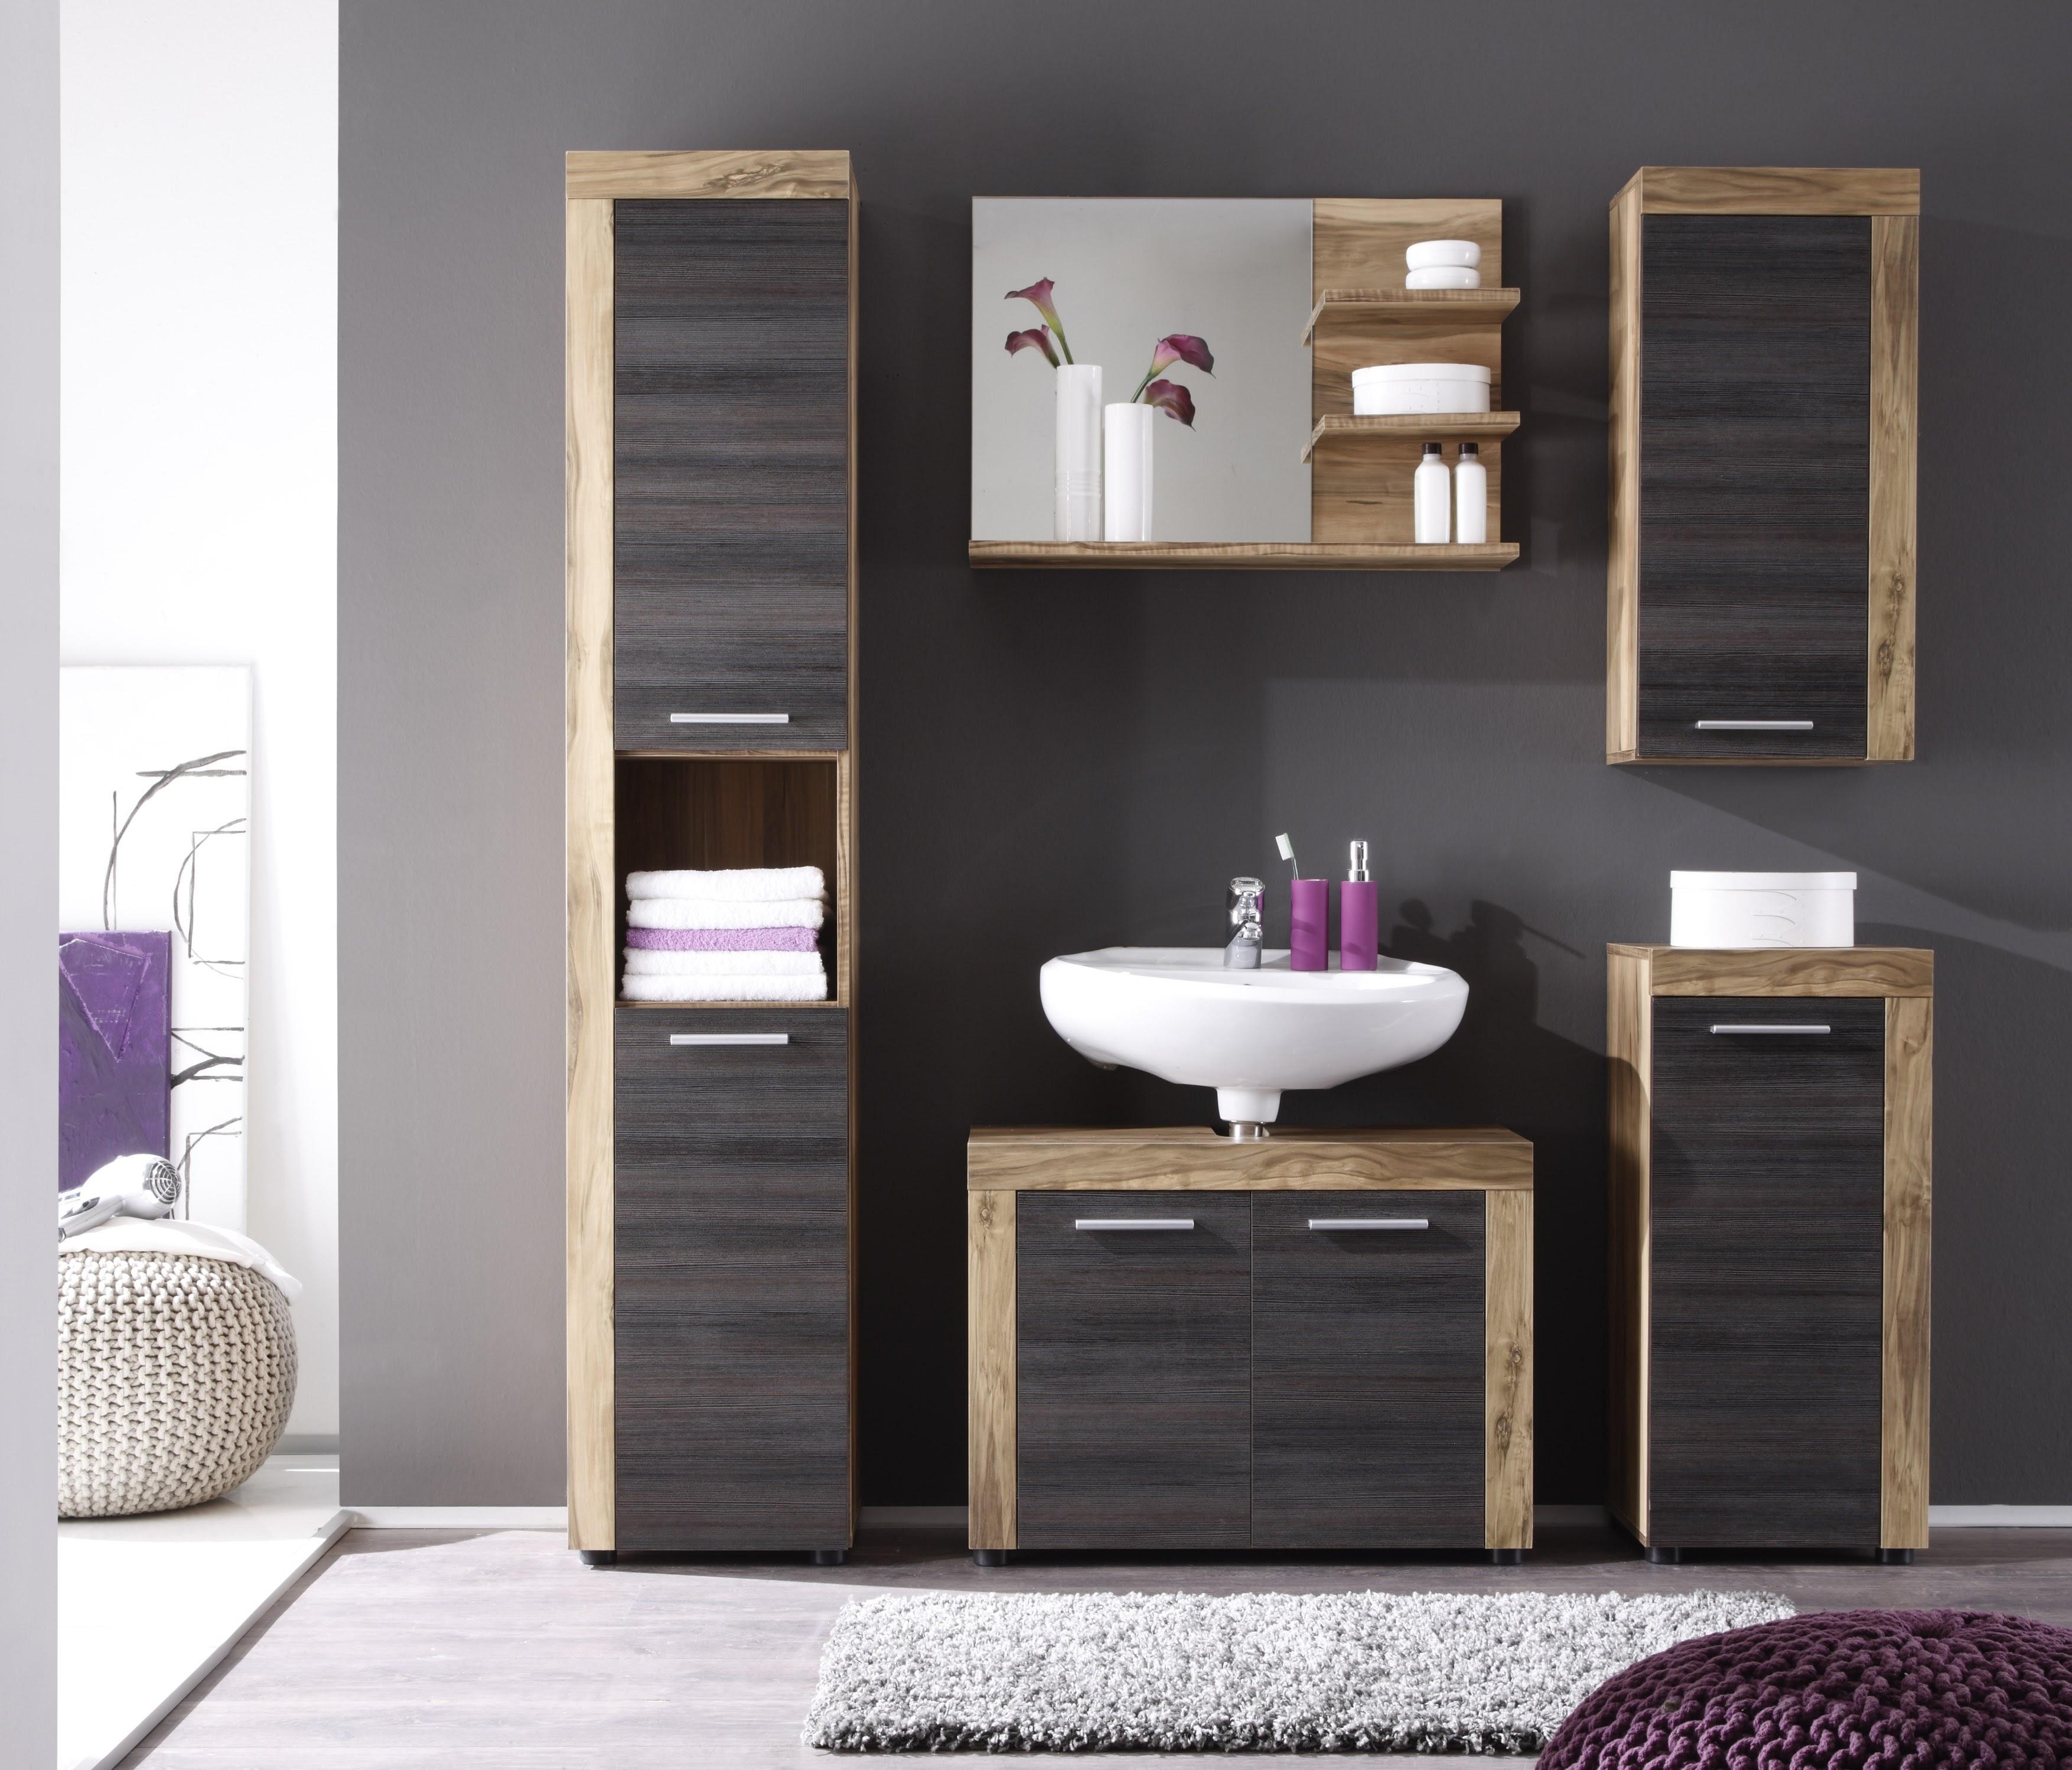 Badezimmer Set Embla 5-teilig in Nussbaum Optik